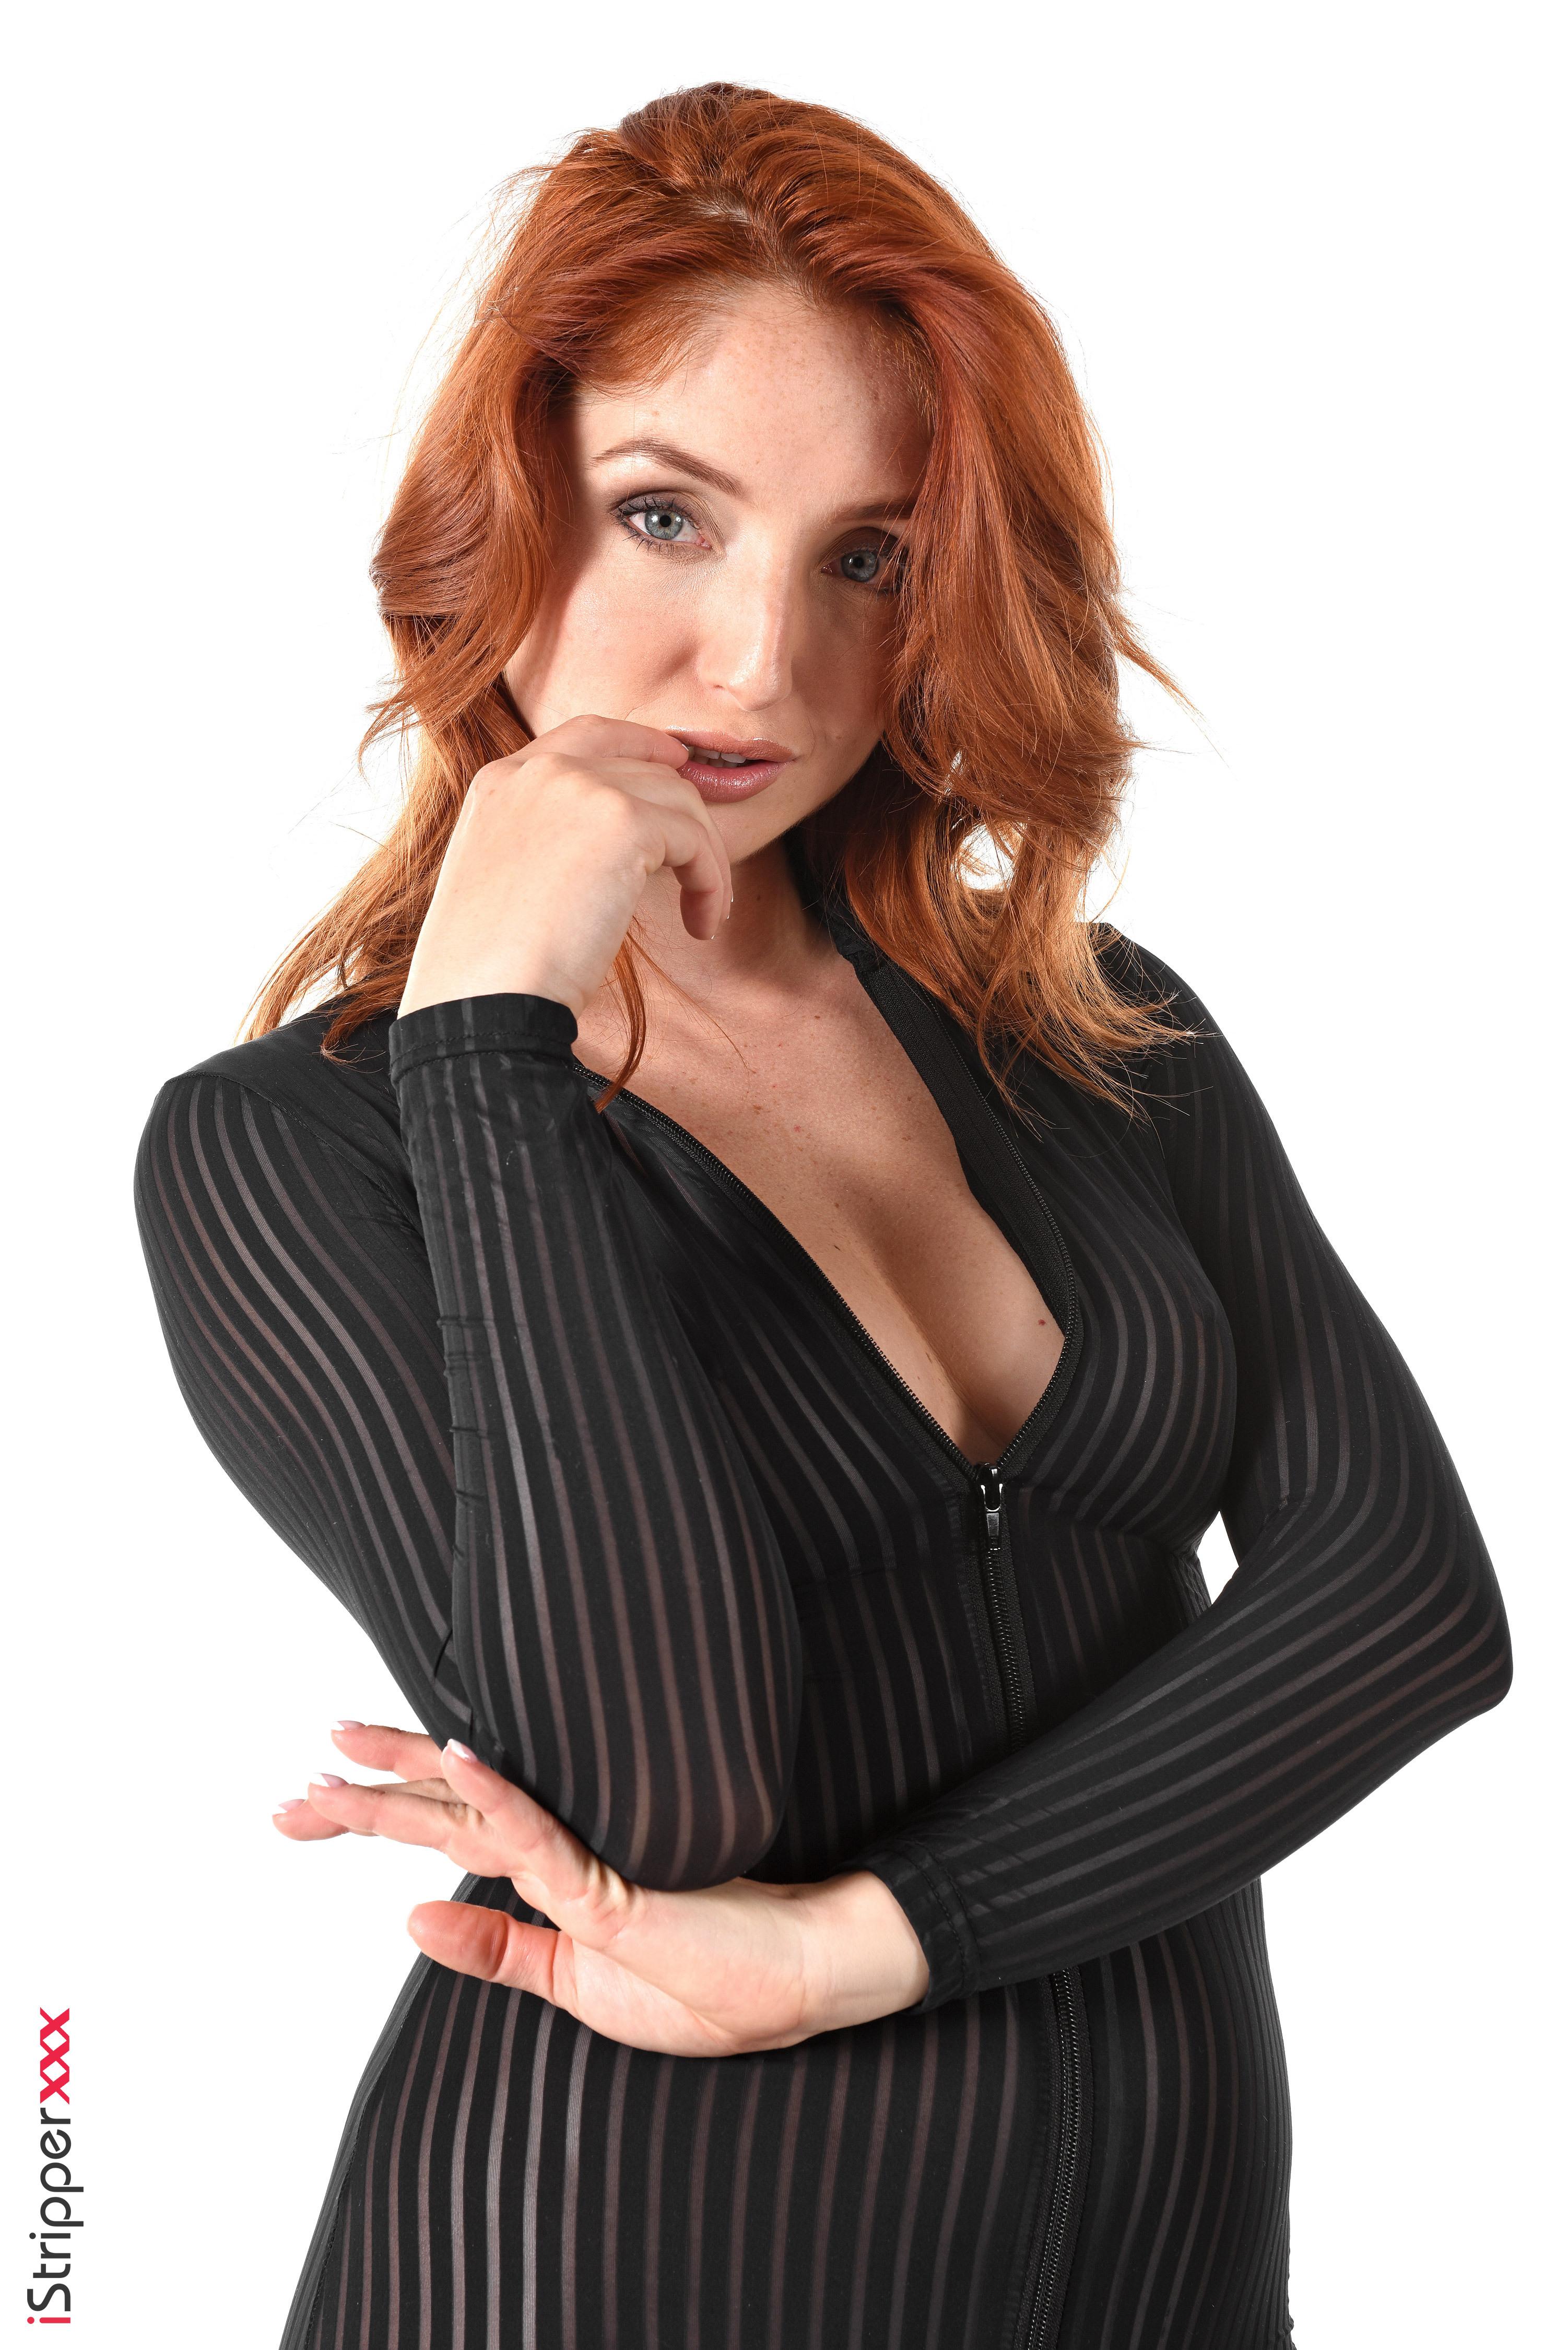 virtual panty brief stripper